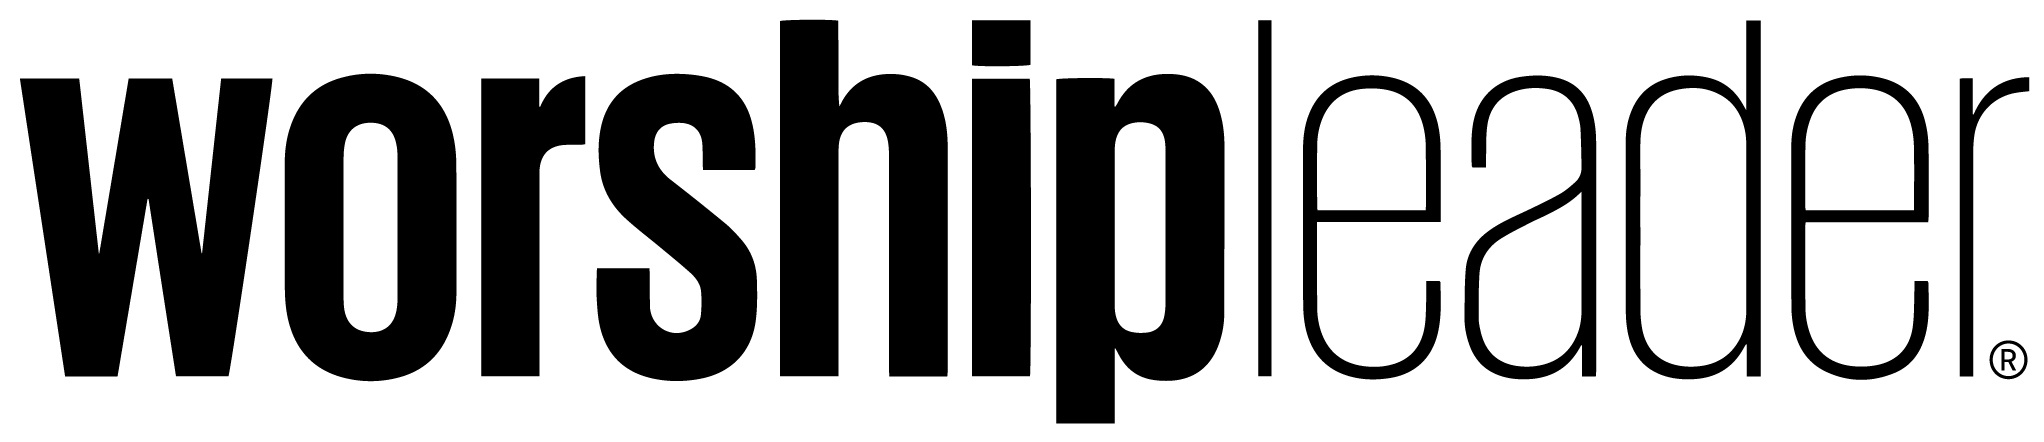 WL+logo_black.jpg